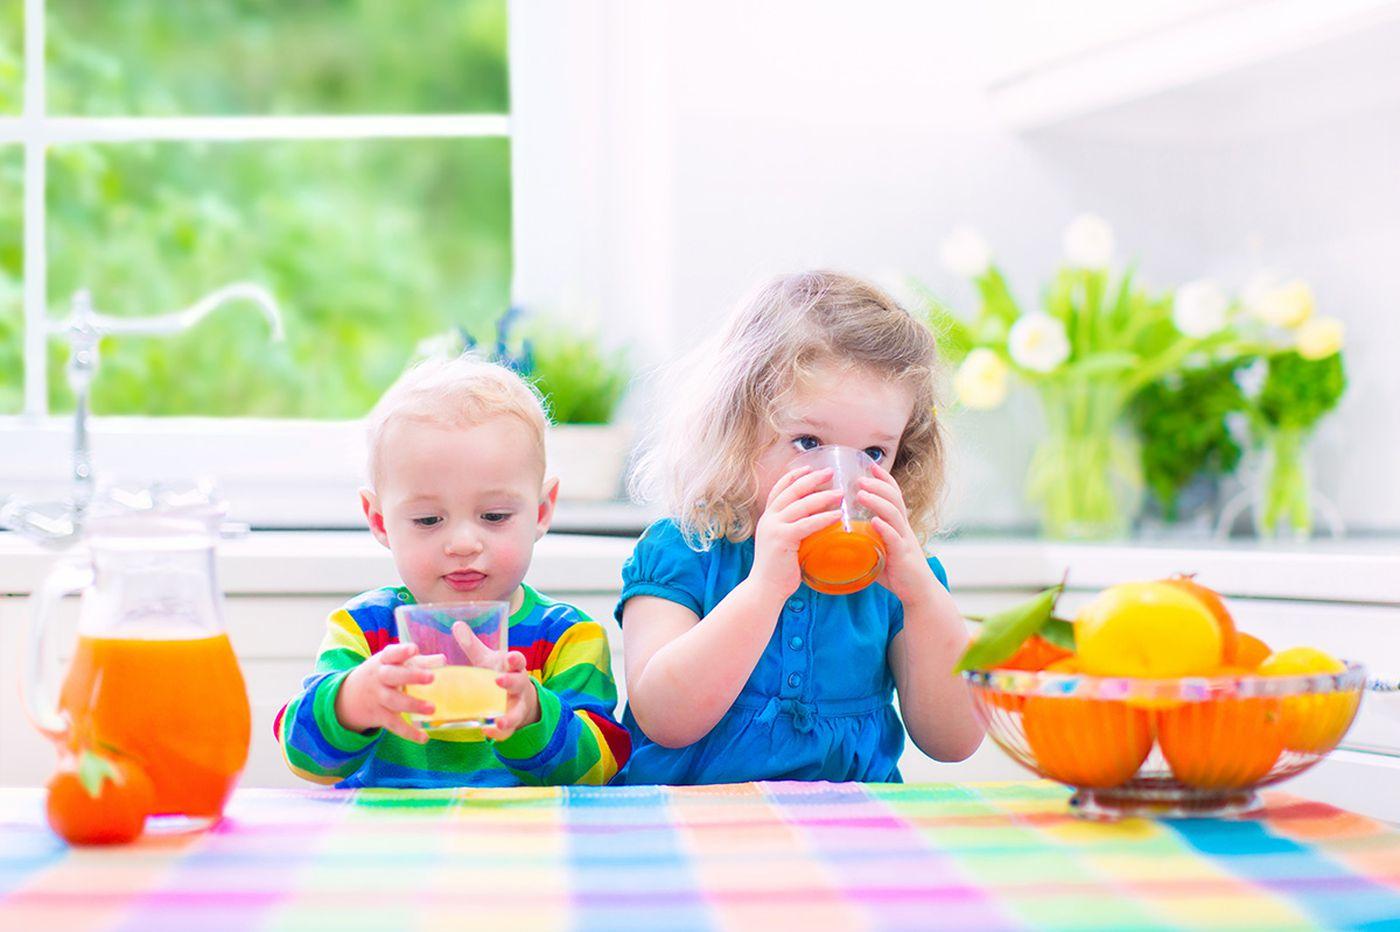 Parents should limit kids' juice consumption, new national guidelines say